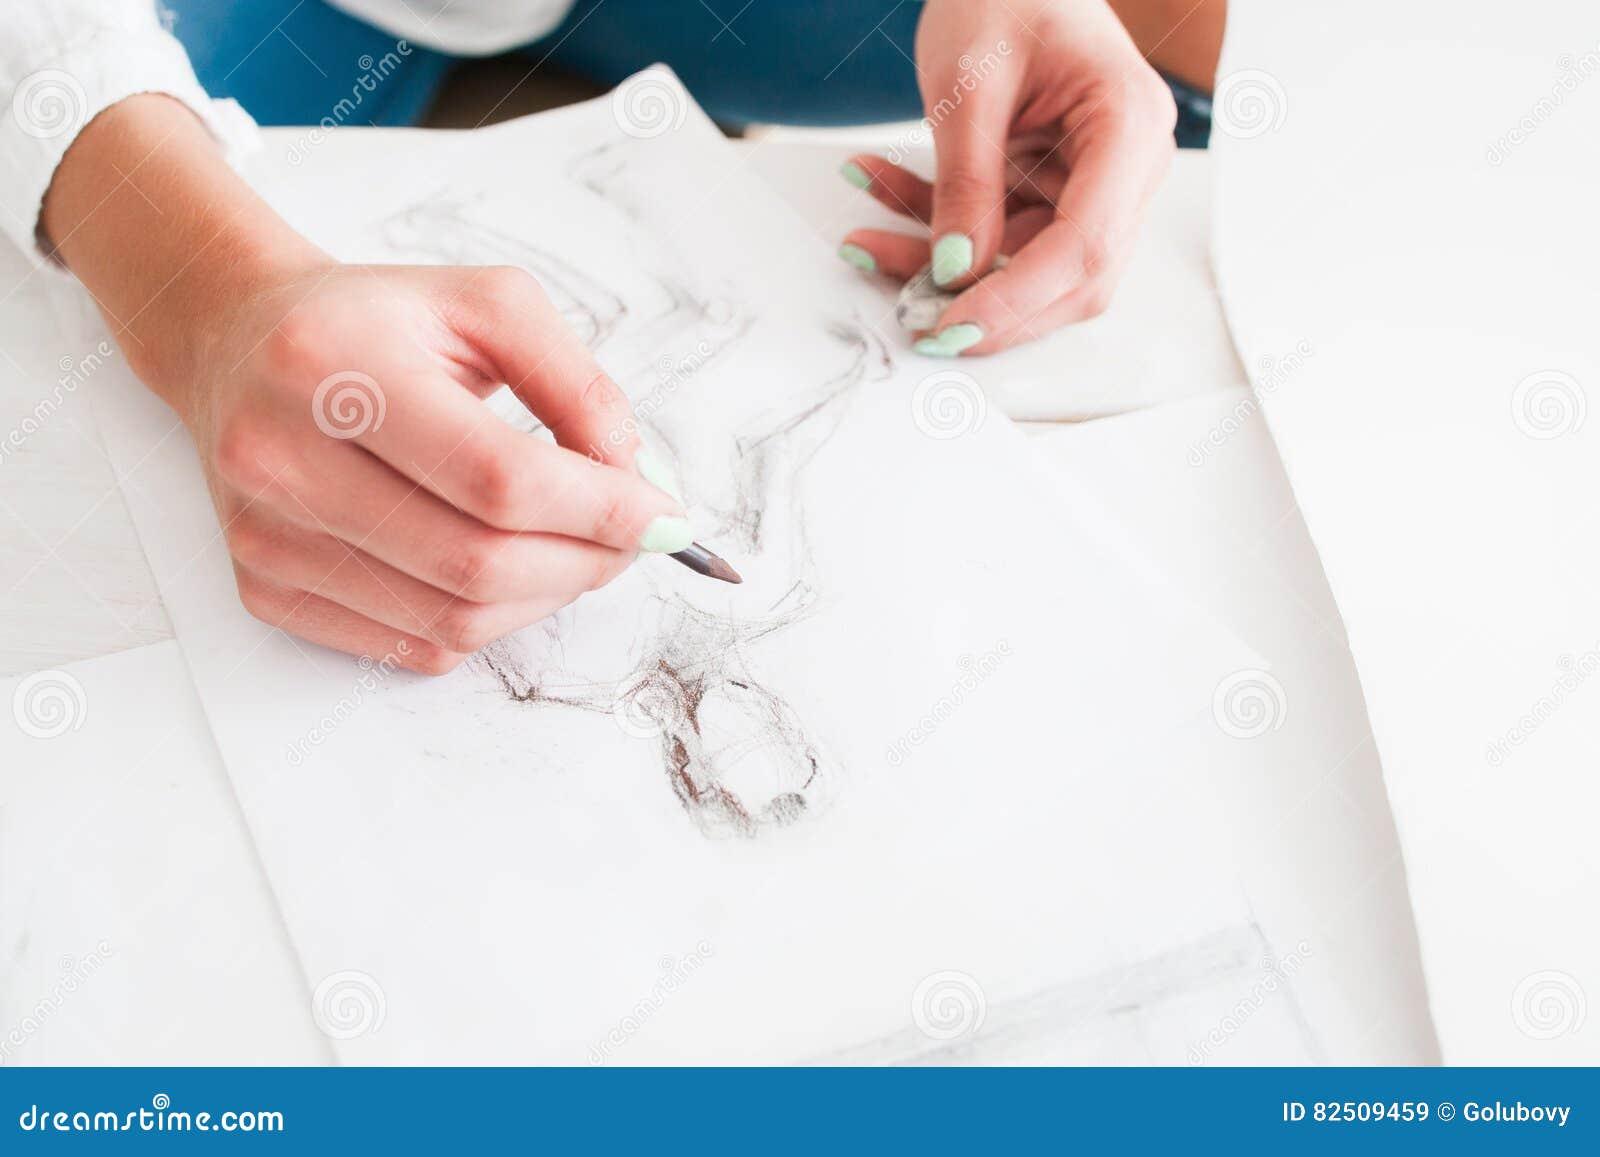 Female Fashion Designer Sketching At Workshop Stock Image Image Of Creative Fashion 82509459